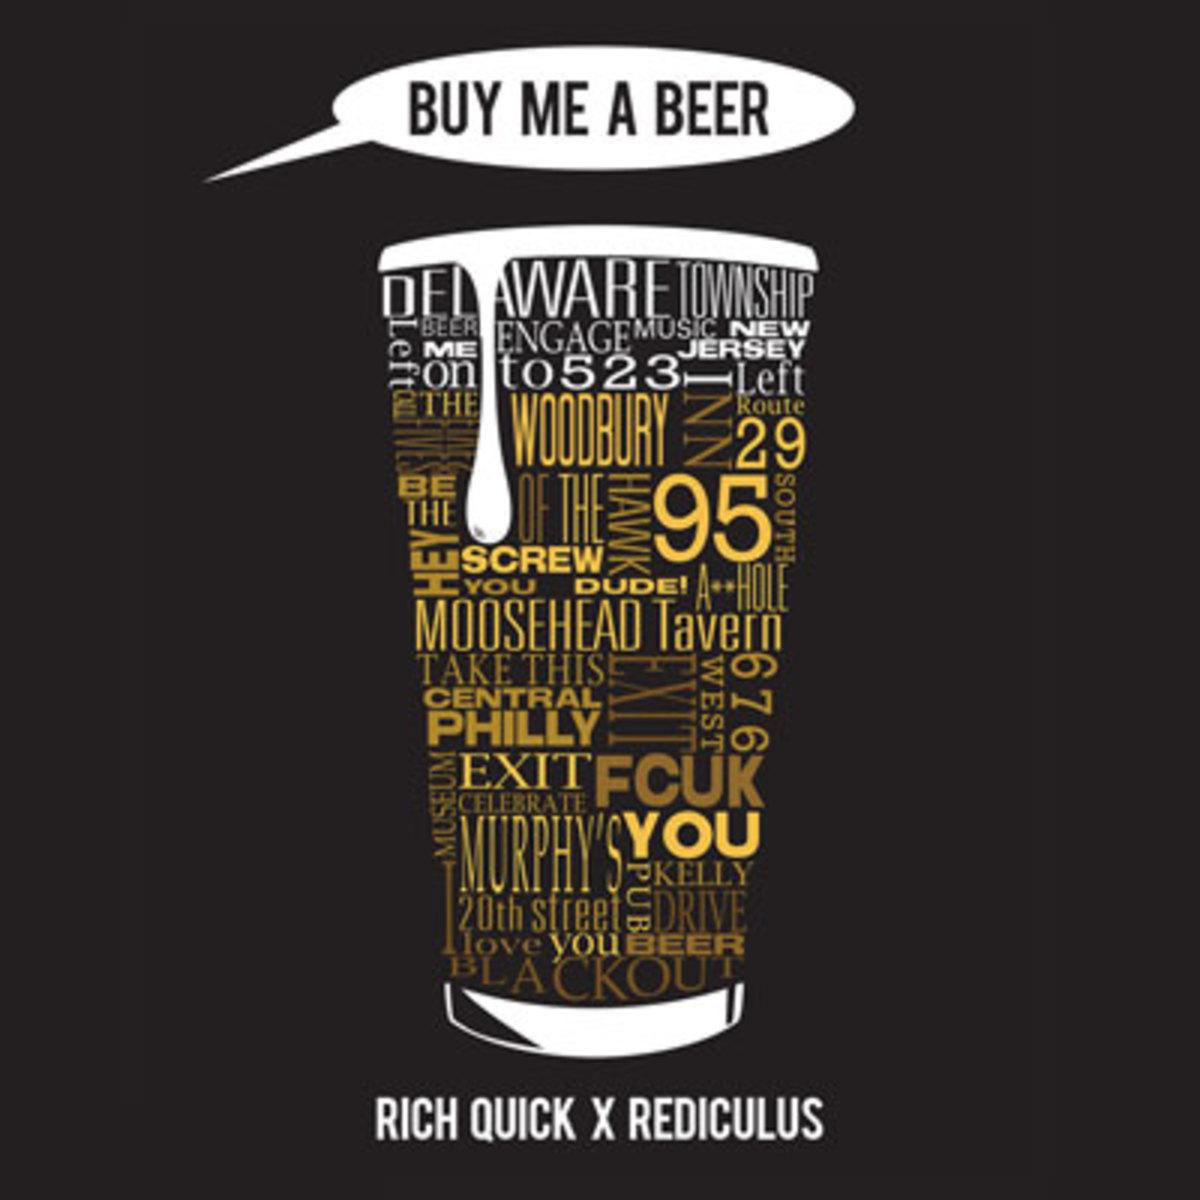 richquick-buymeabeer.jpg